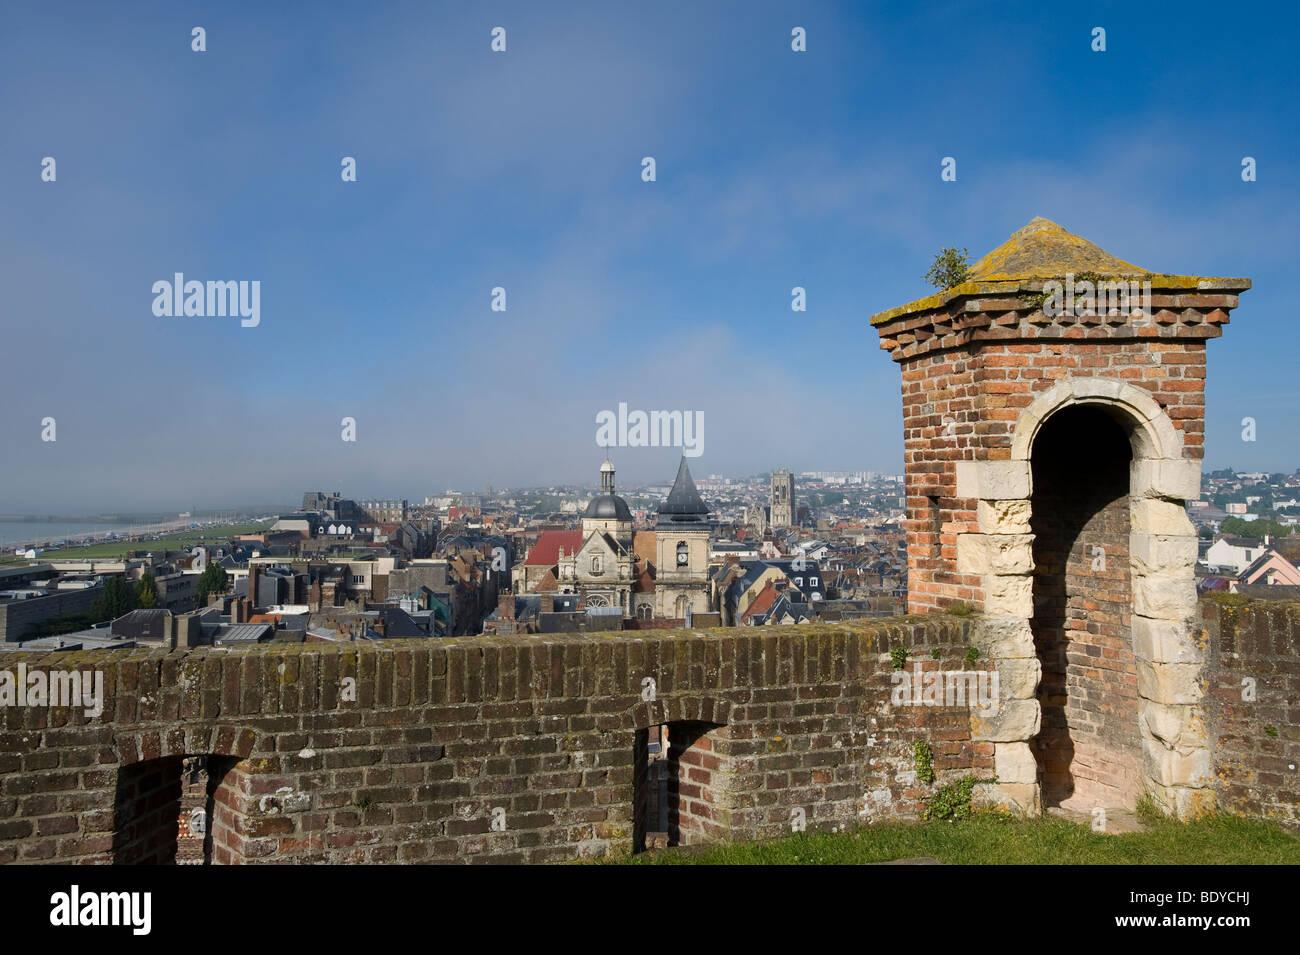 View of Dieppe, Nord-Pas-de-Calais, France, Europe - Stock Image